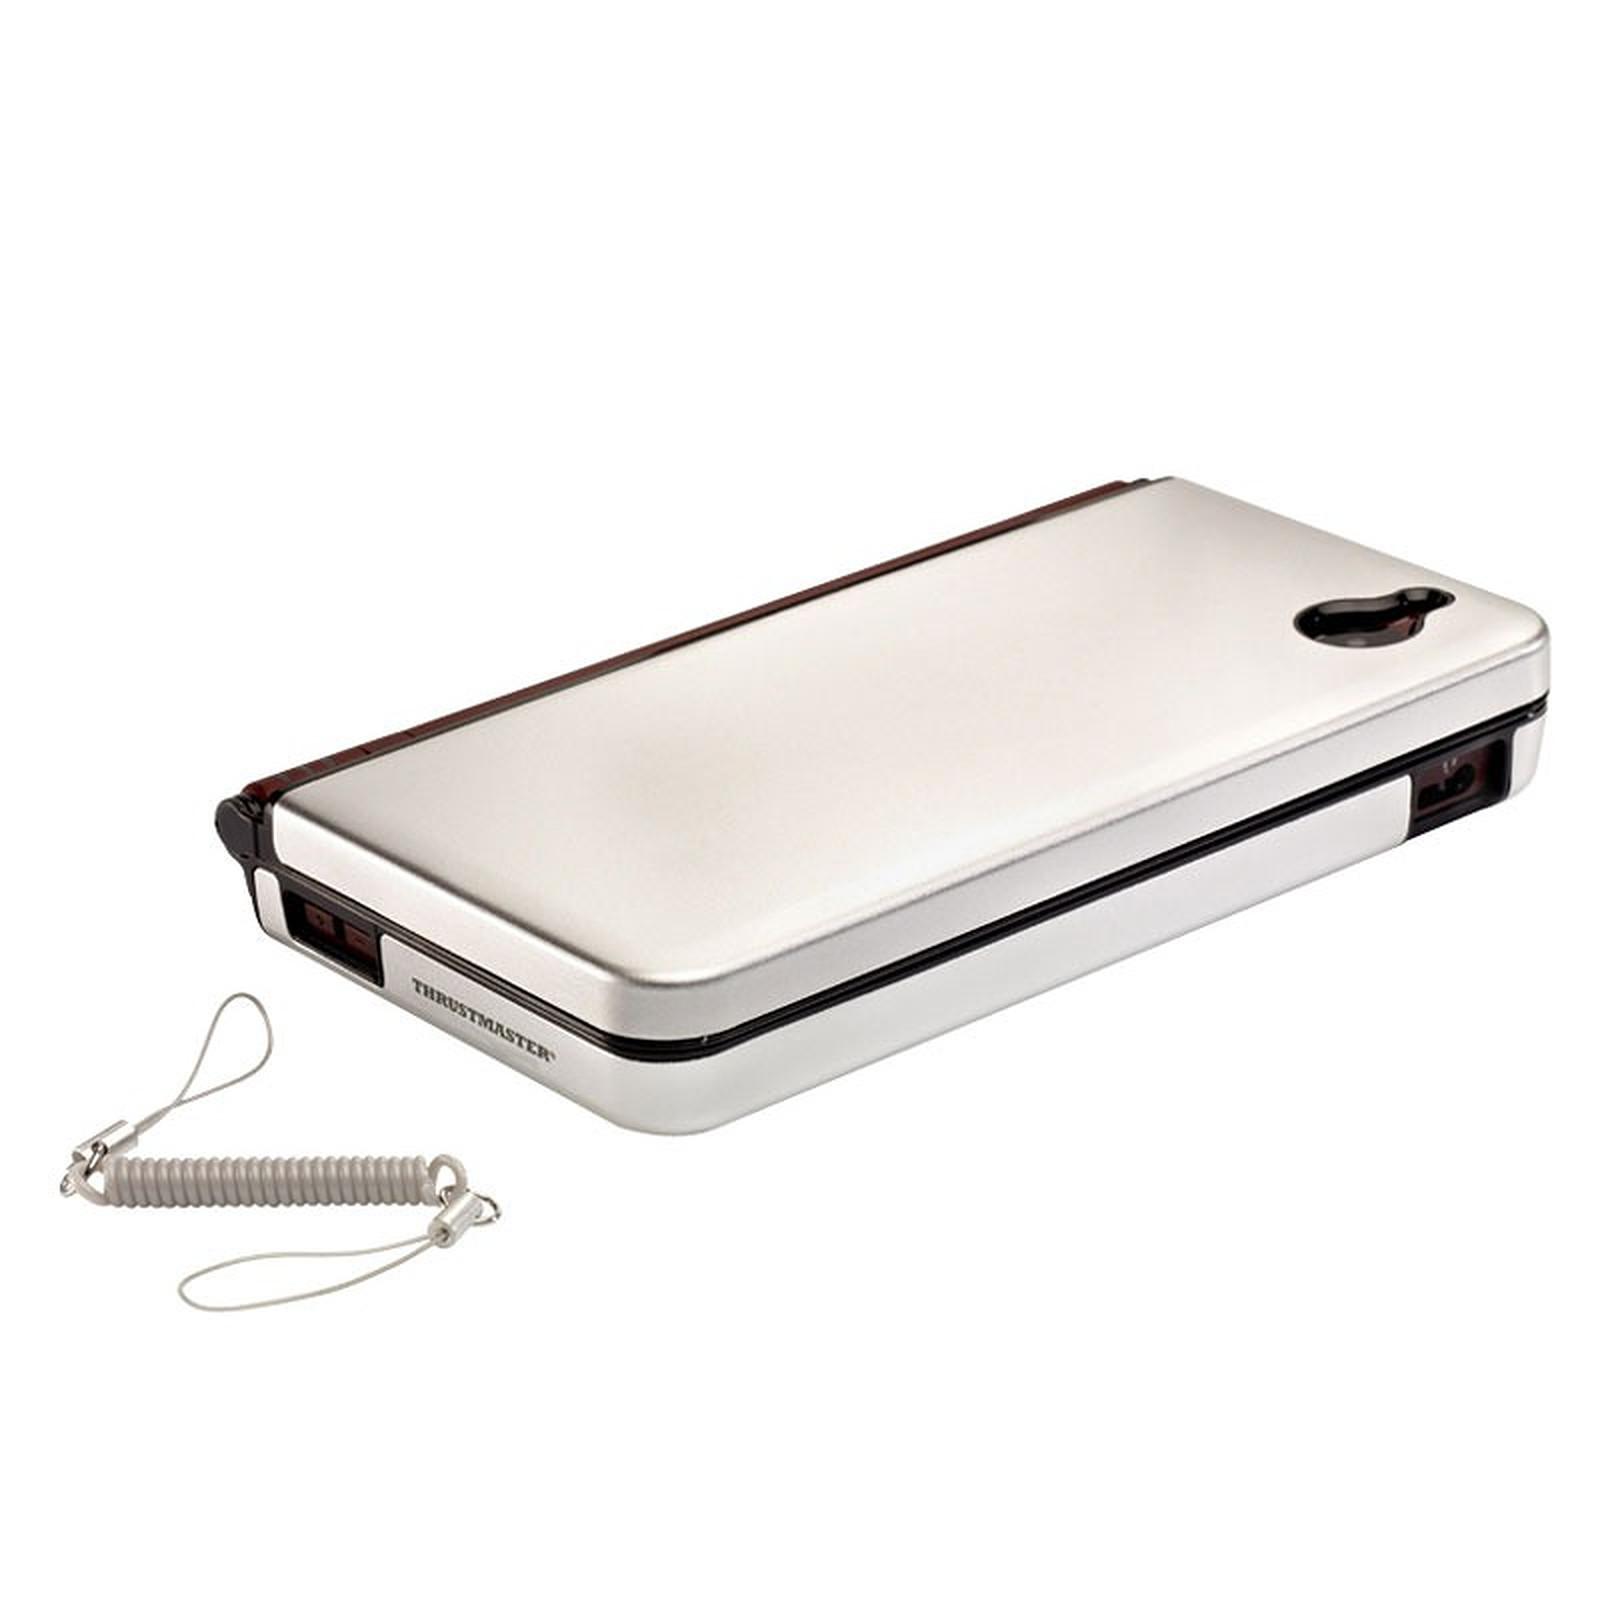 Thrustmaster Metal Case Platinum Silver (Nintendo DSi XL)